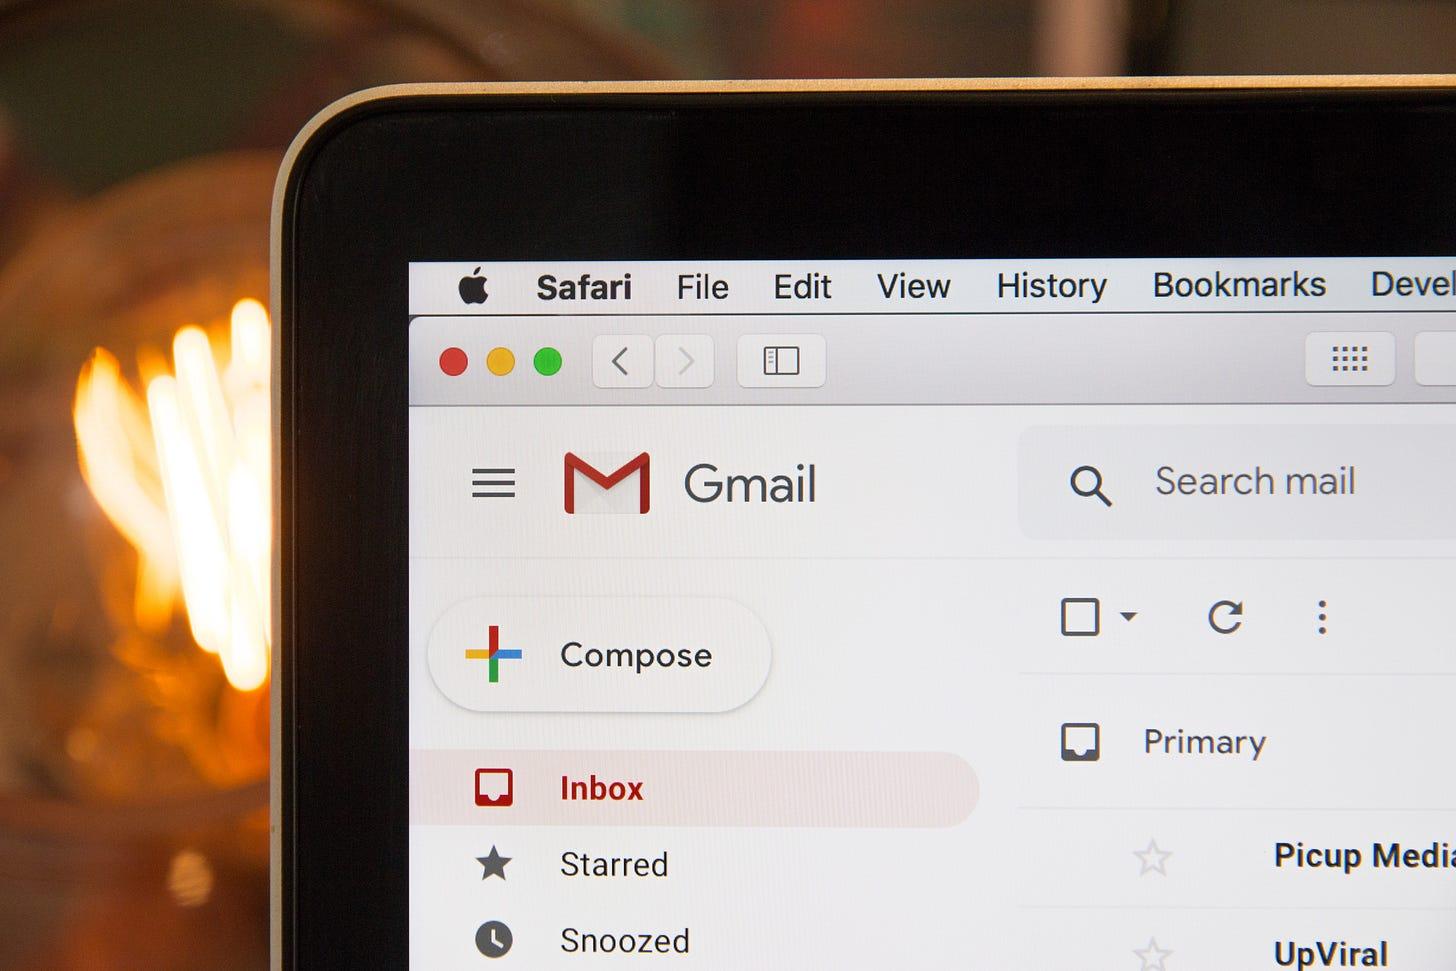 Gmail open on a laptop browser. Stephen Phillips / Unsplash